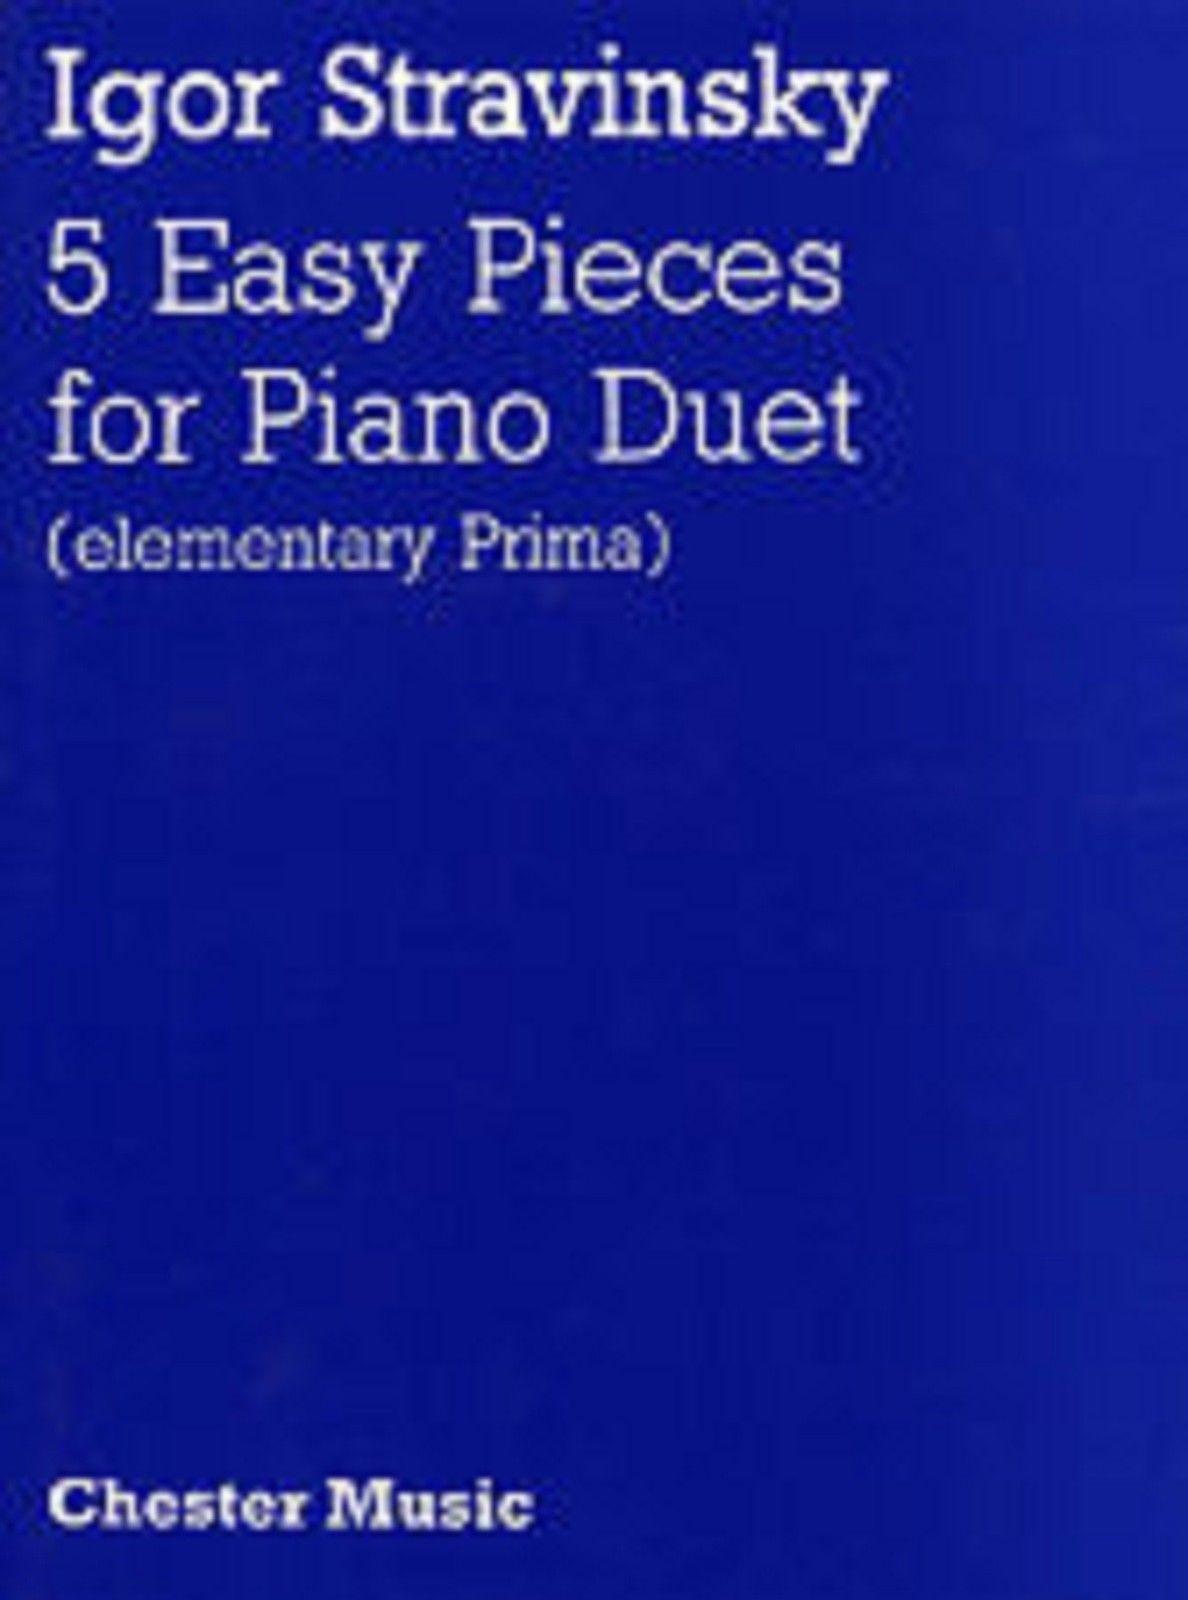 Igor Stravinsky Five Easy Pieces Piano Duet Sheet Music Elementary Prima S16